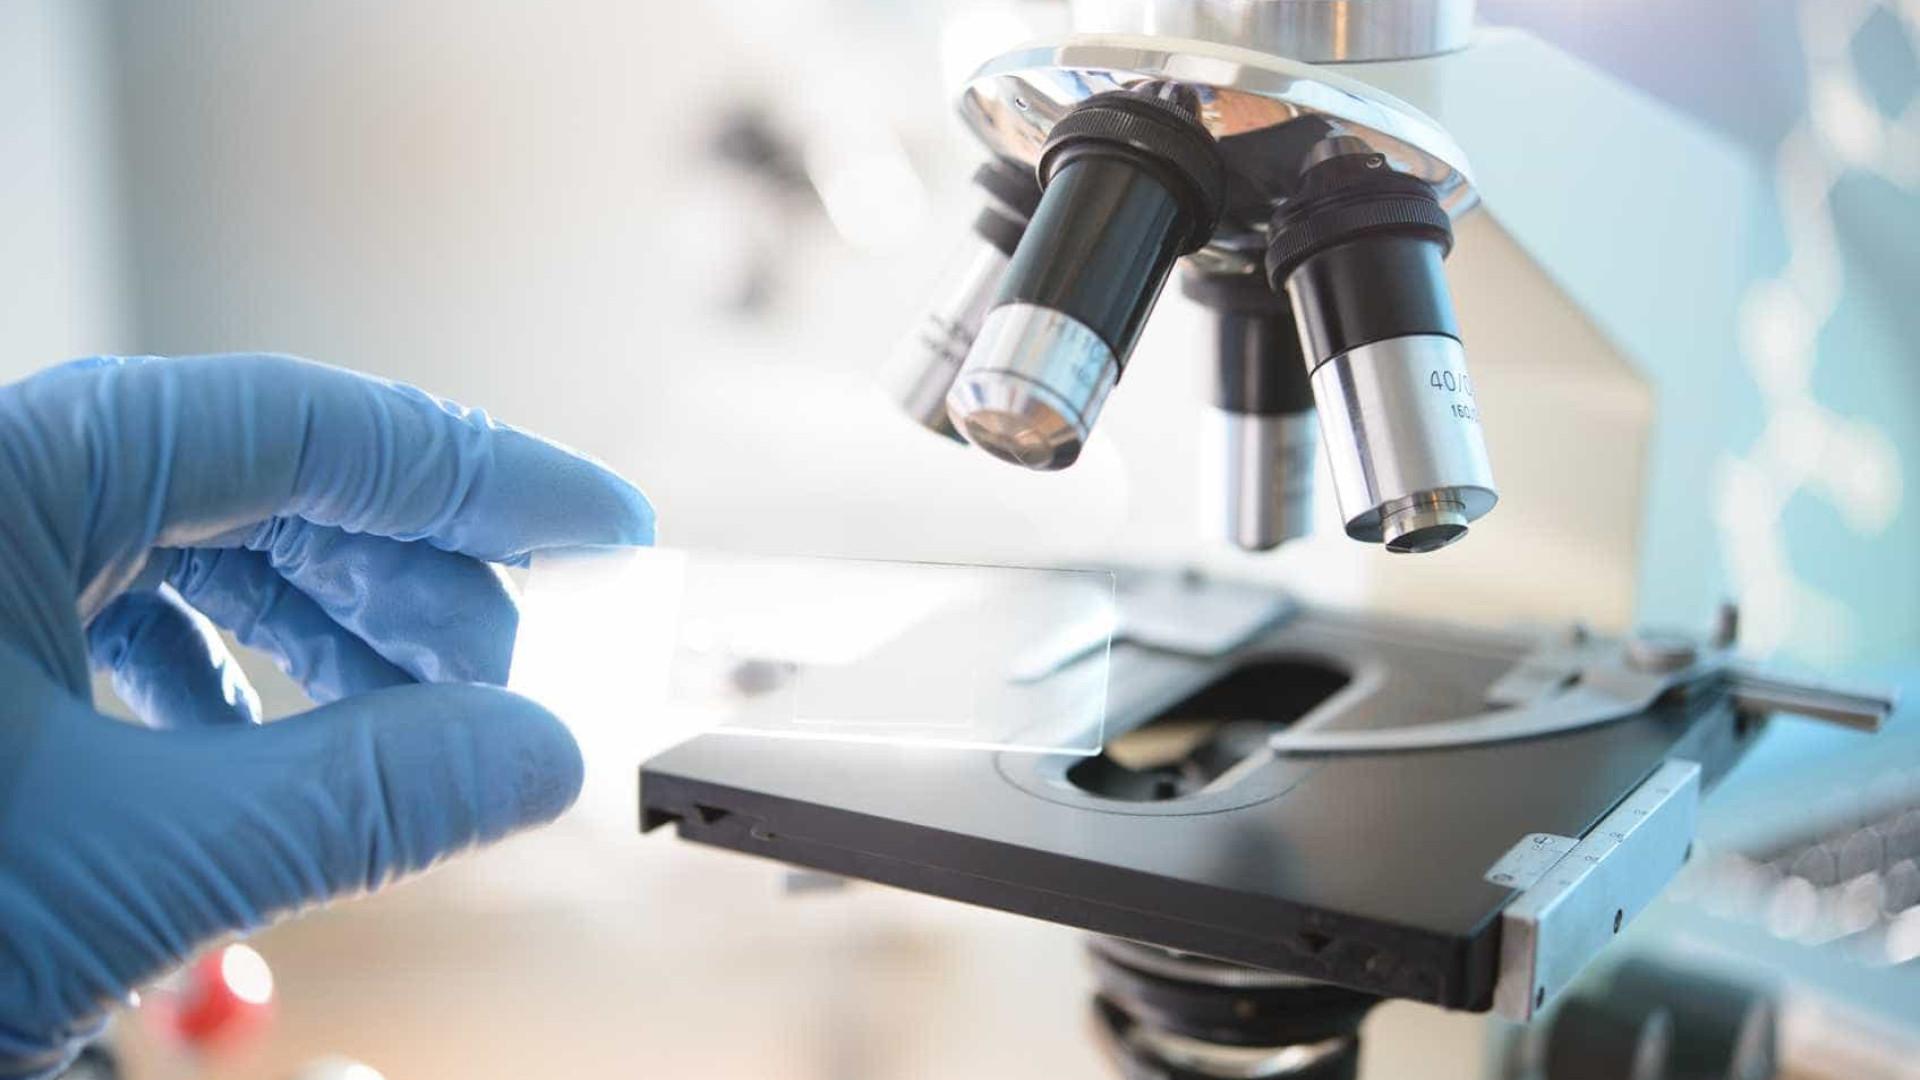 Presença de proteína na salmonela torna bactéria virulenta